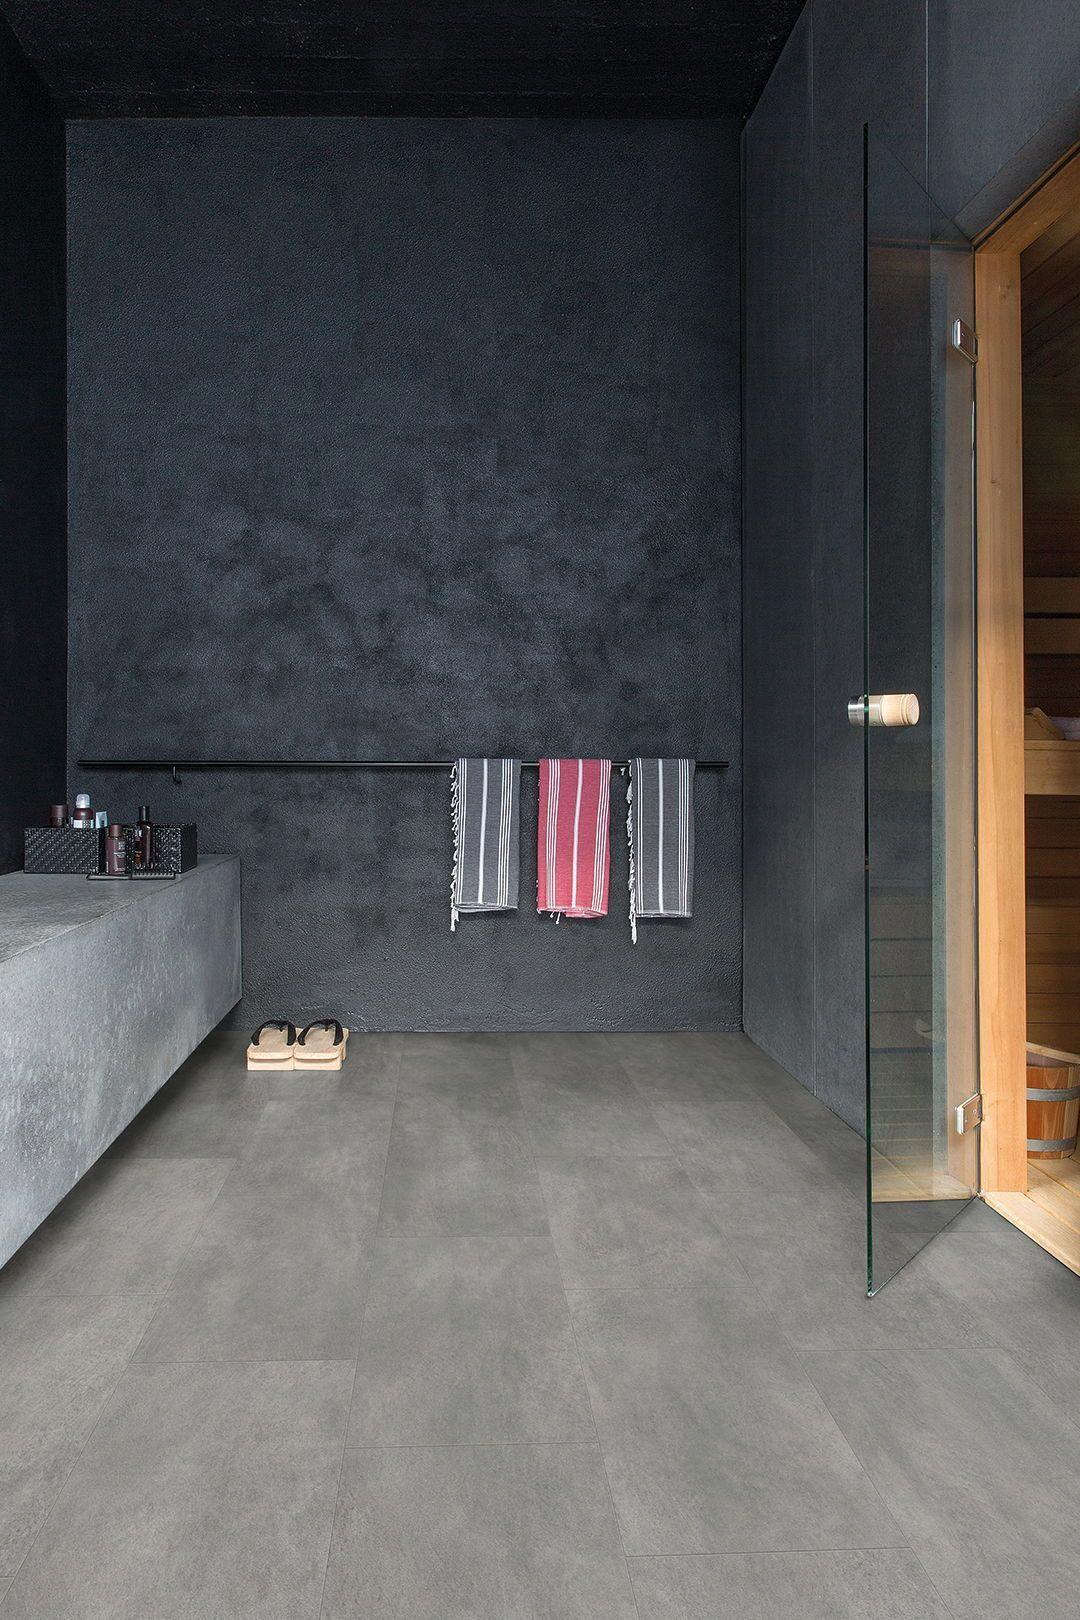 The Grey Vinyl Flooring Tiles Add A Beautiful Dark Look To This Stunning Modern Bathroom Find Your Fav Grey Vinyl Flooring Grey Bathrooms Bathroom Floor Tiles